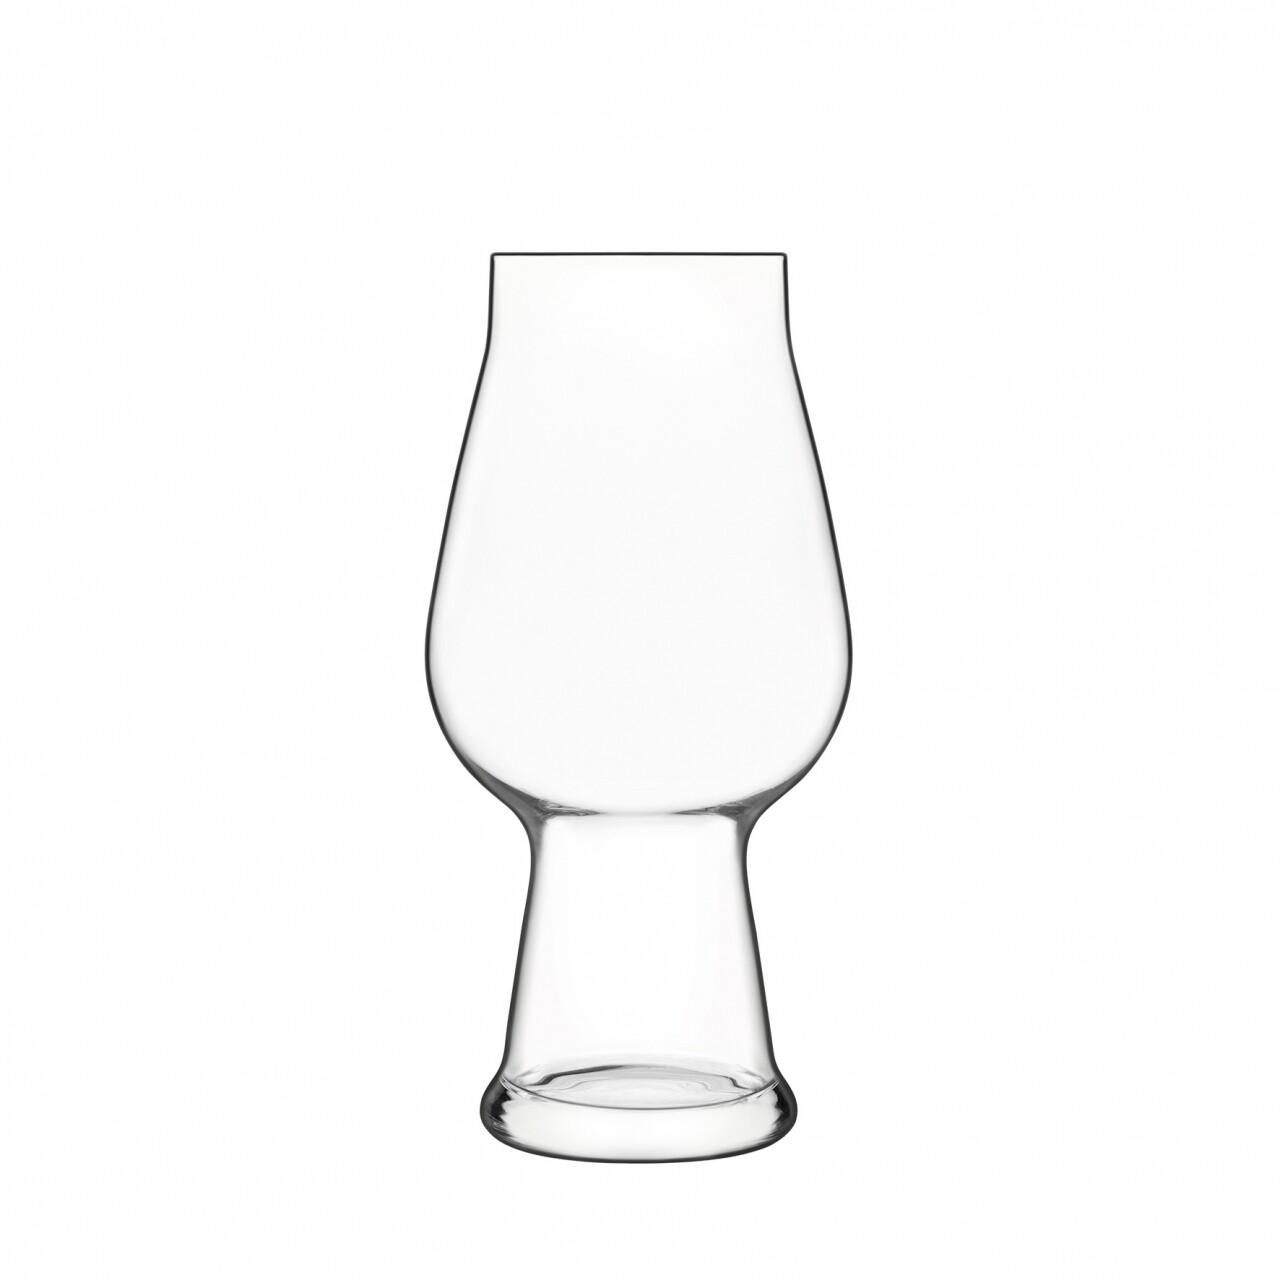 Set 6 pahare bere Birrateque IPA white, Luigi Bormioli, 532 ml, sticla cristalina, transparent